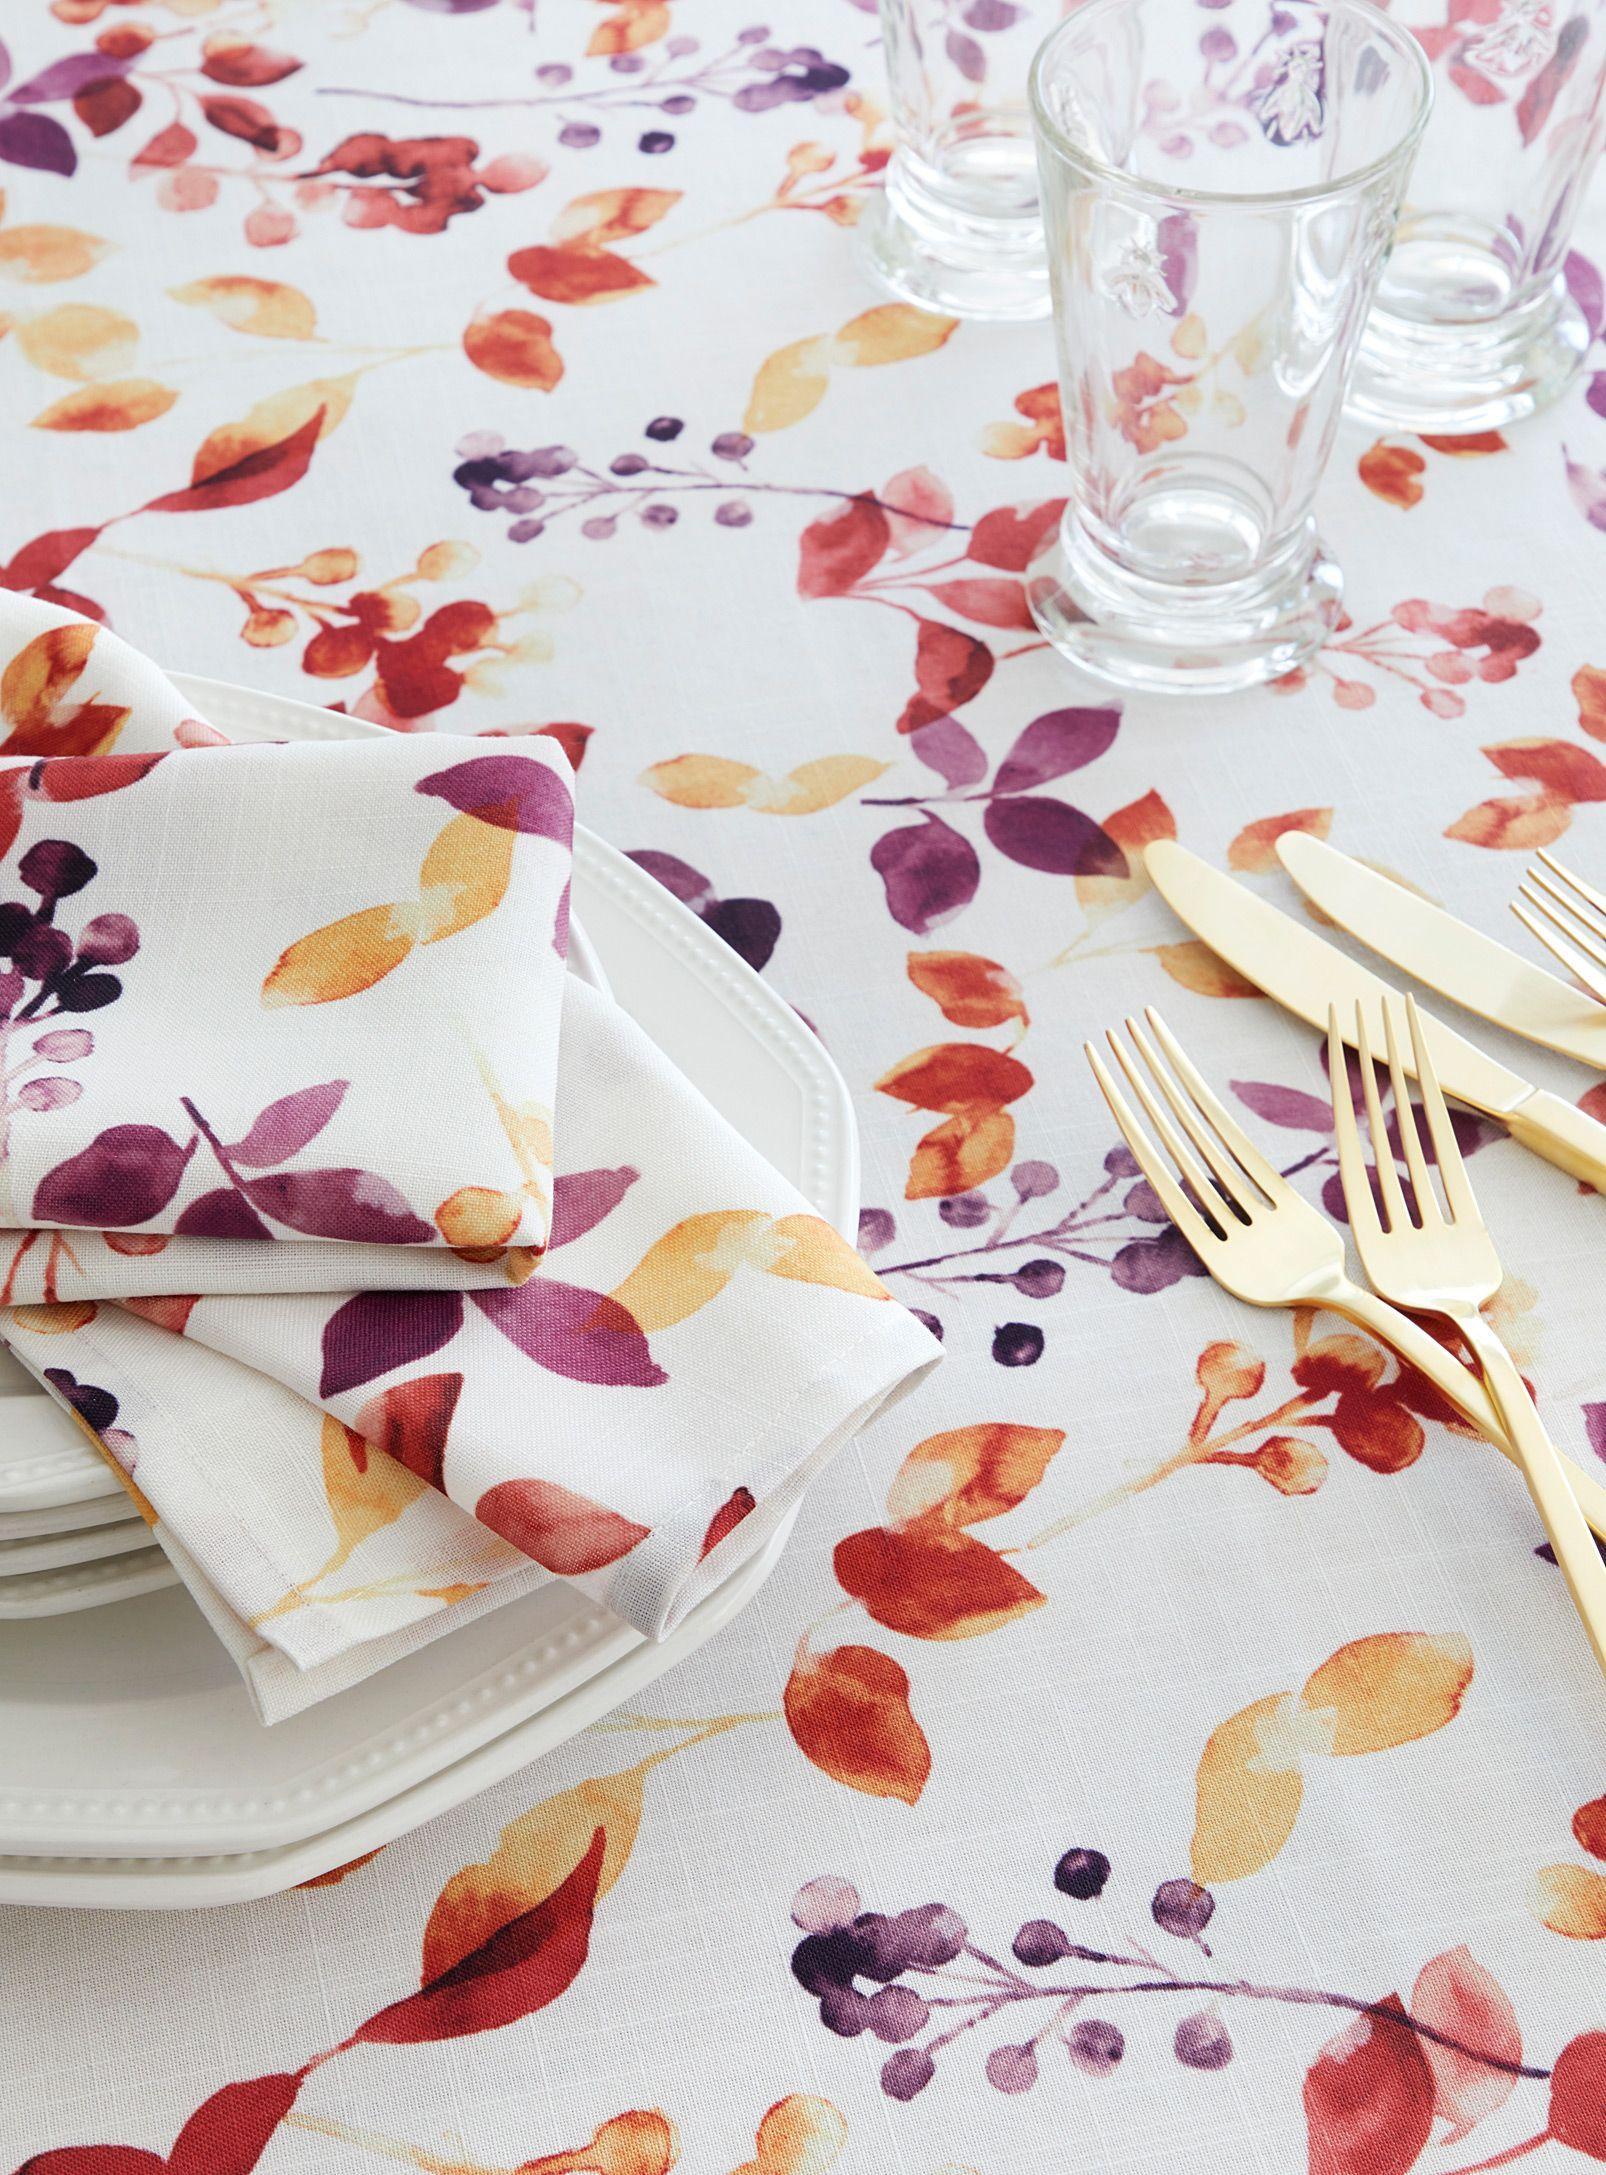 Leaf Tablecloth Samantha Pynn X Simons Trendy Printed Tablecloths Available Online